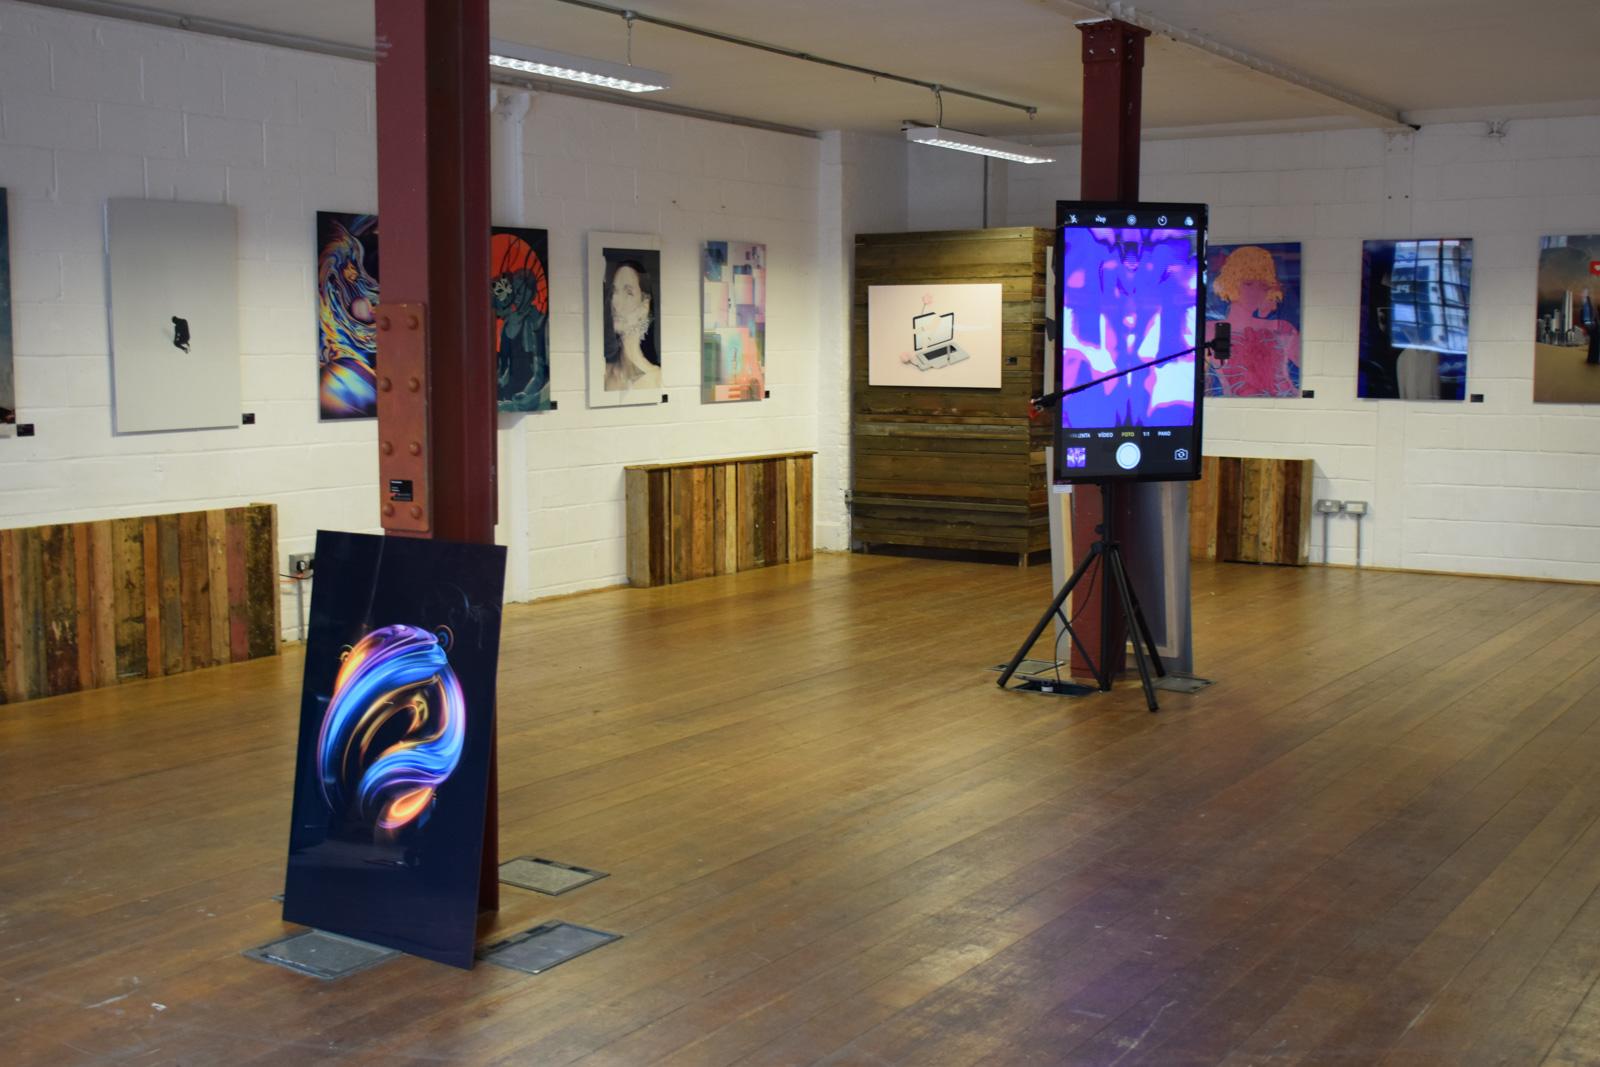 Artwork by Rik Oostenbroek in front